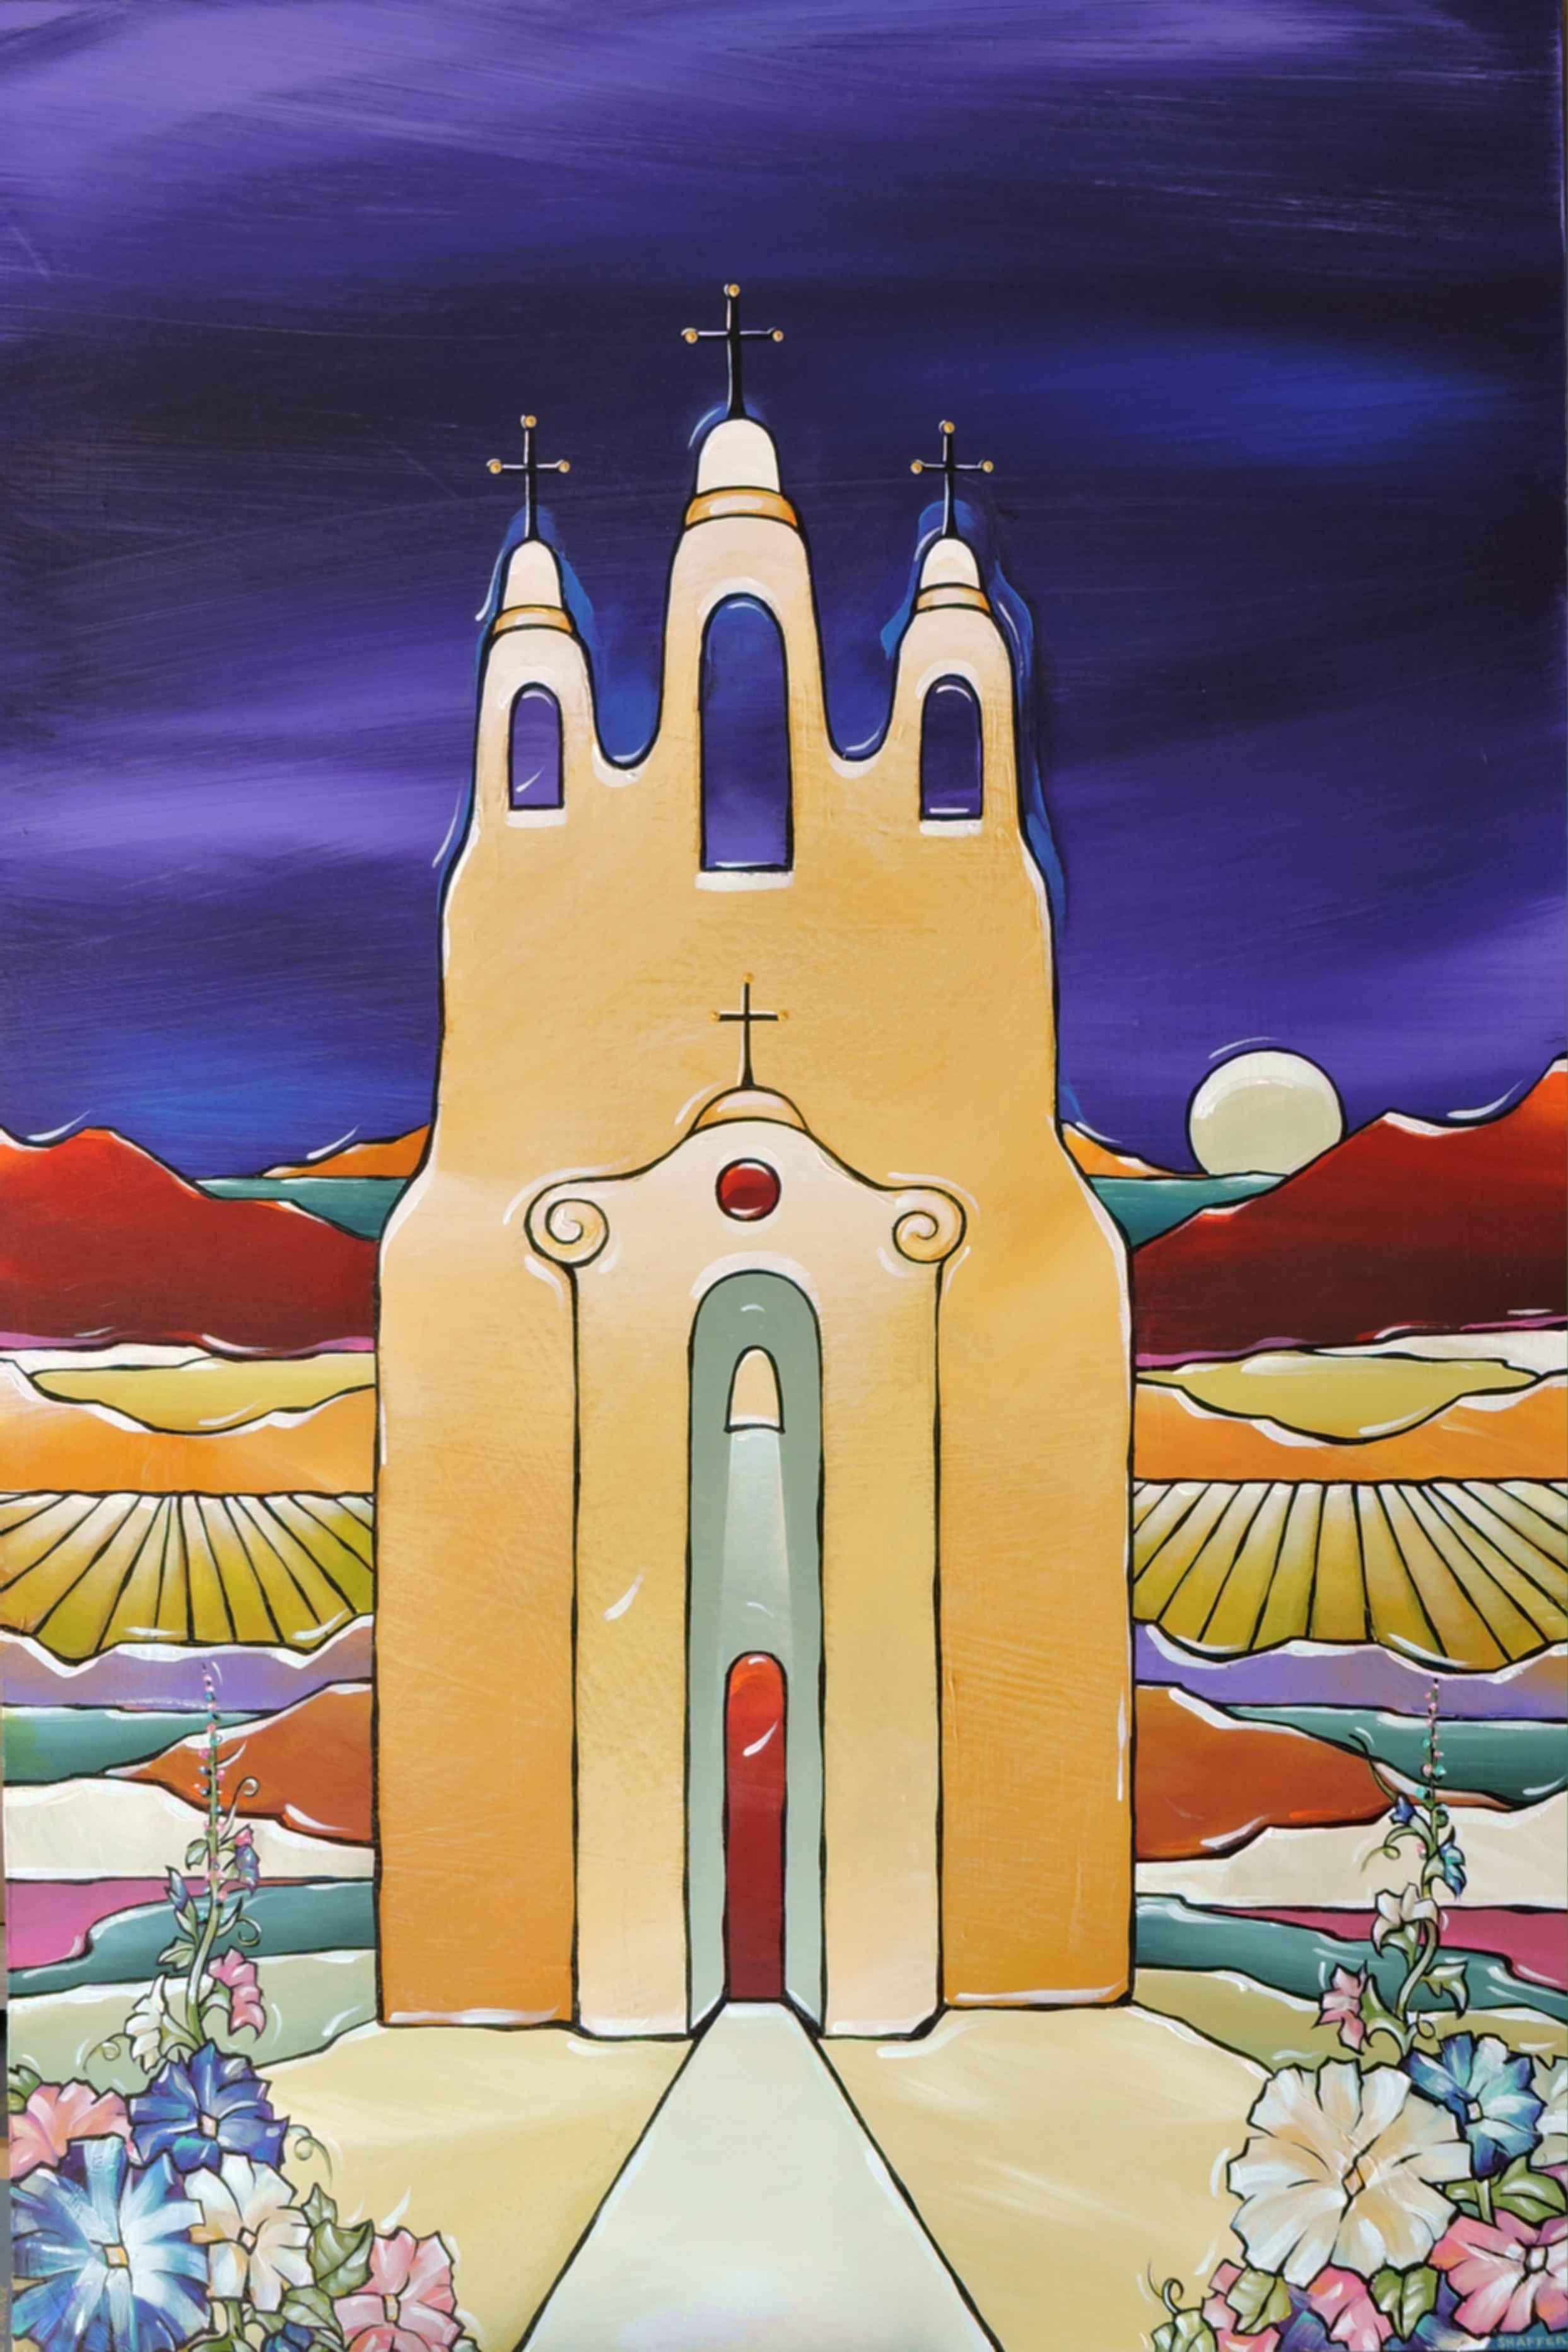 Nectar by  SJ. Shaffer - Masterpiece Online